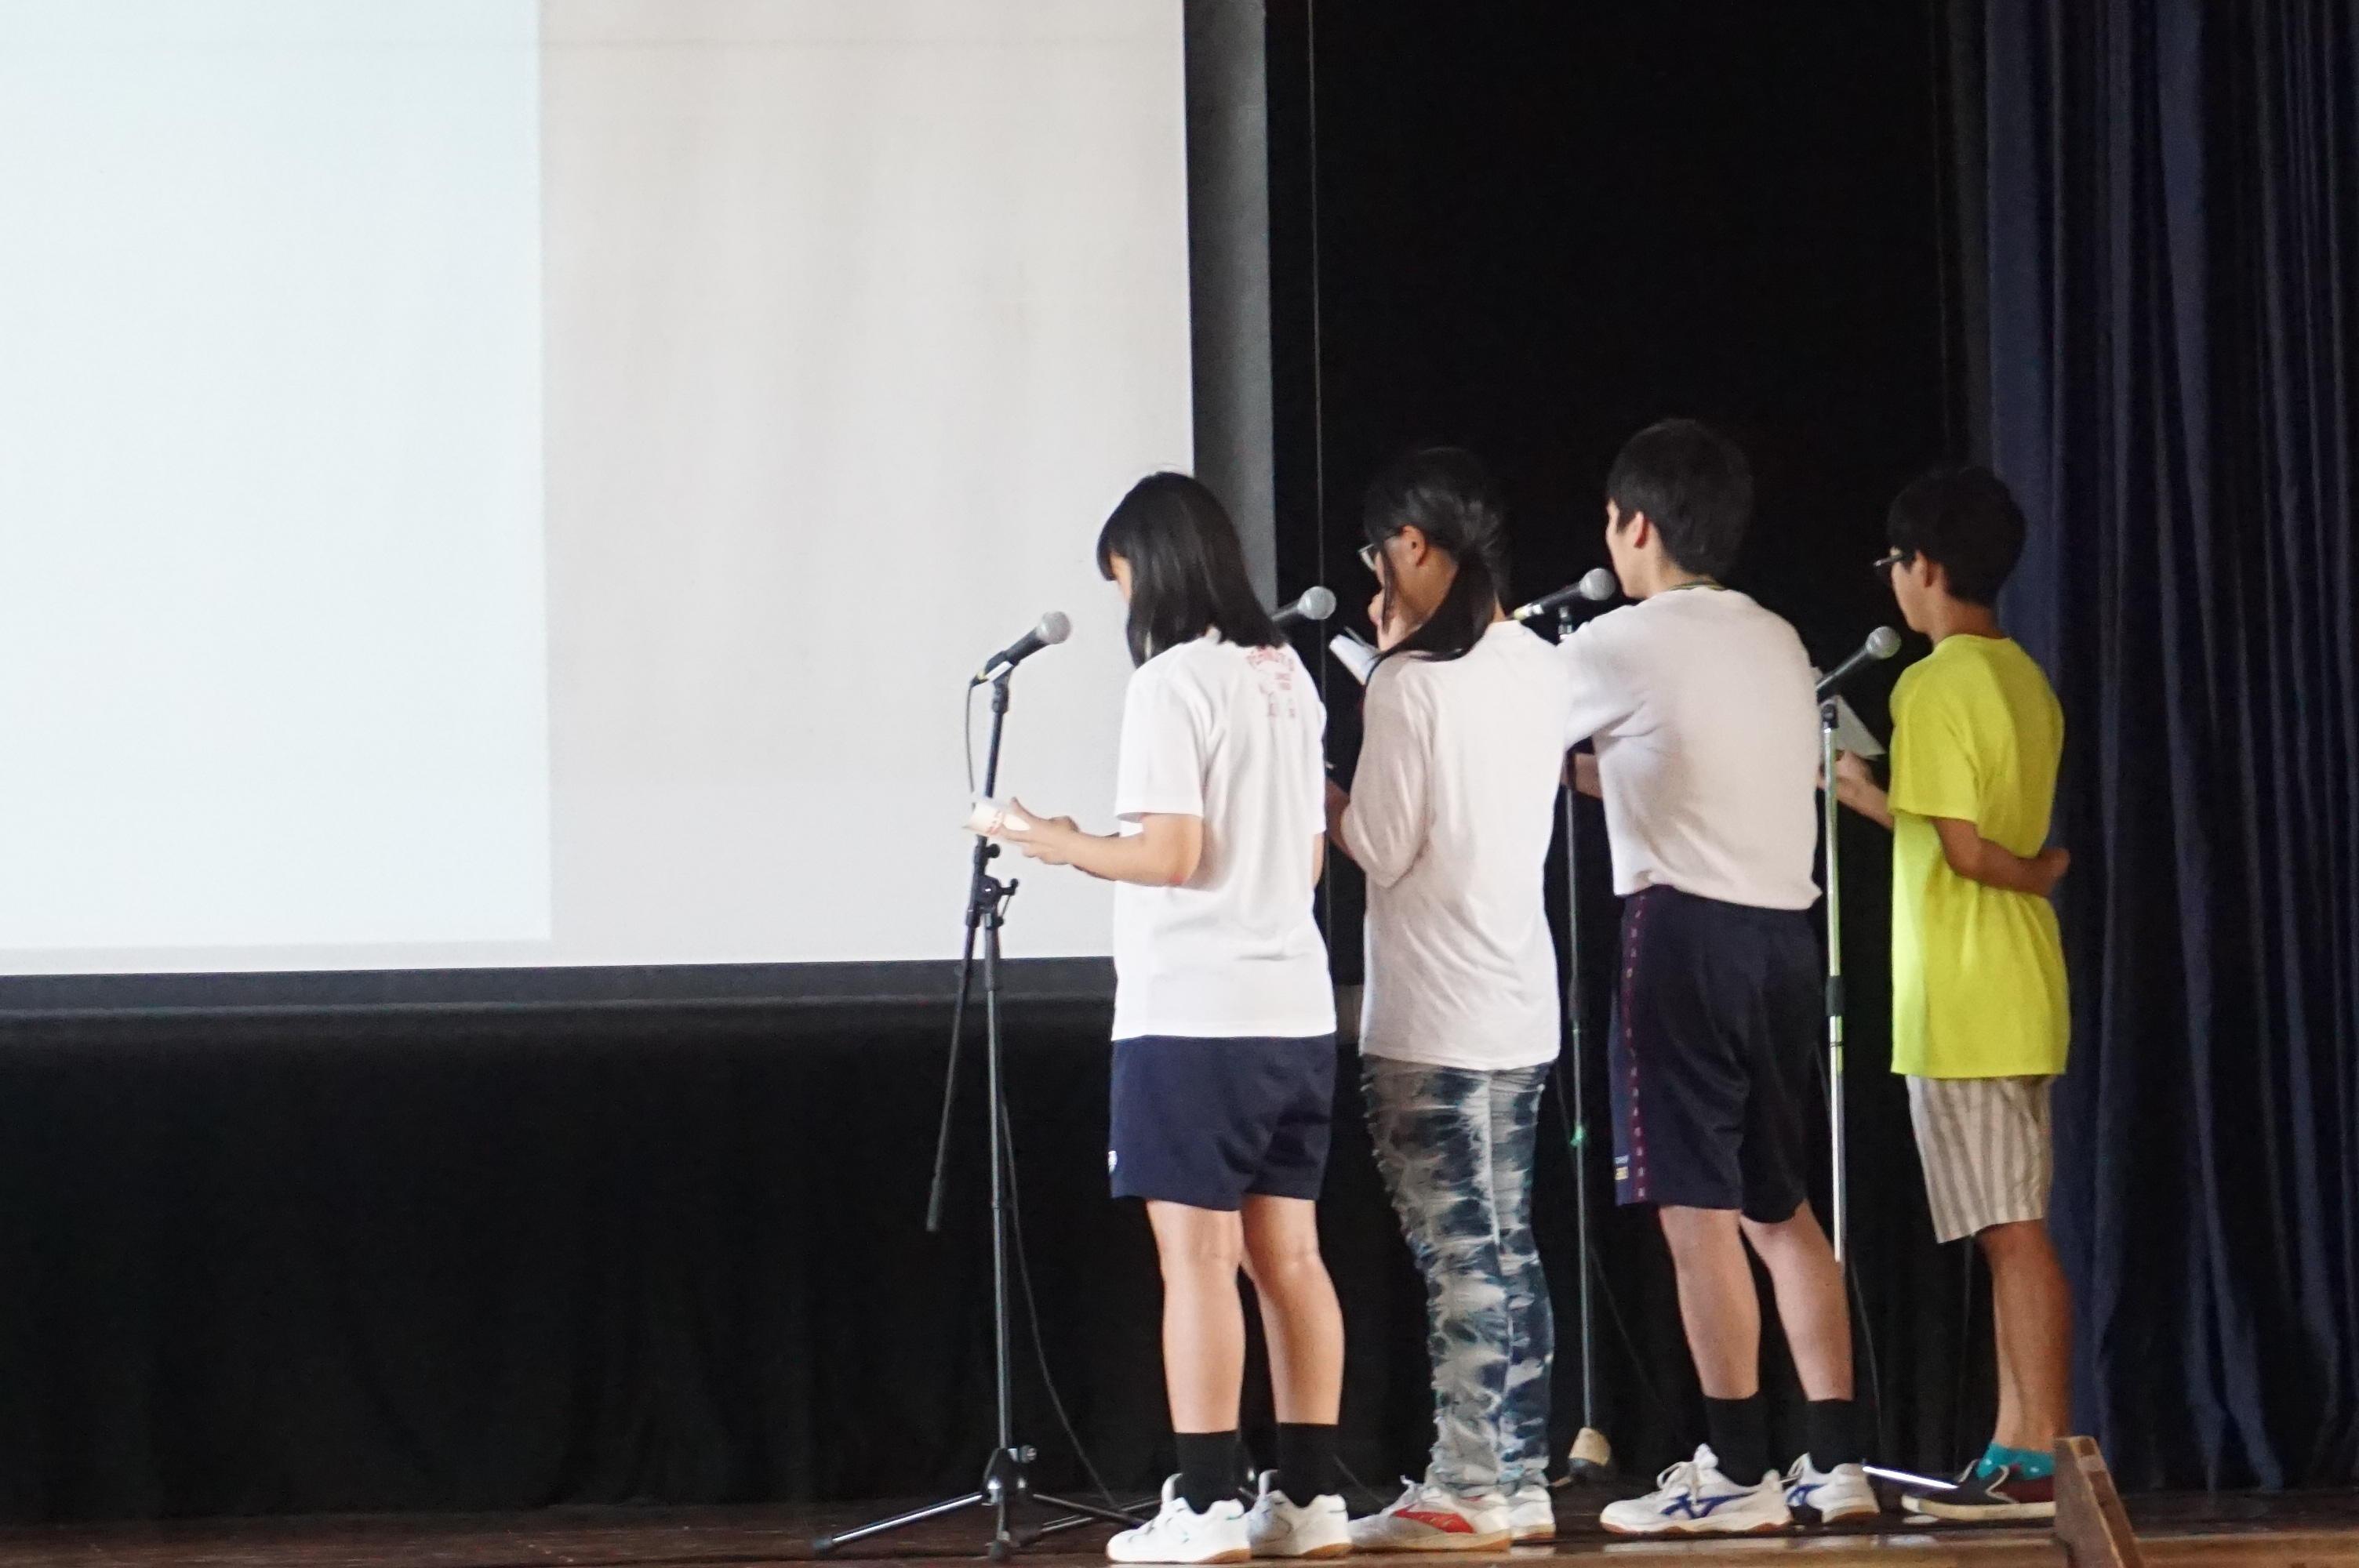 http://news.yoshimoto.co.jp/20170912123614-ae774df648a55d9c41426a88c2c65a625c3f695a.jpg